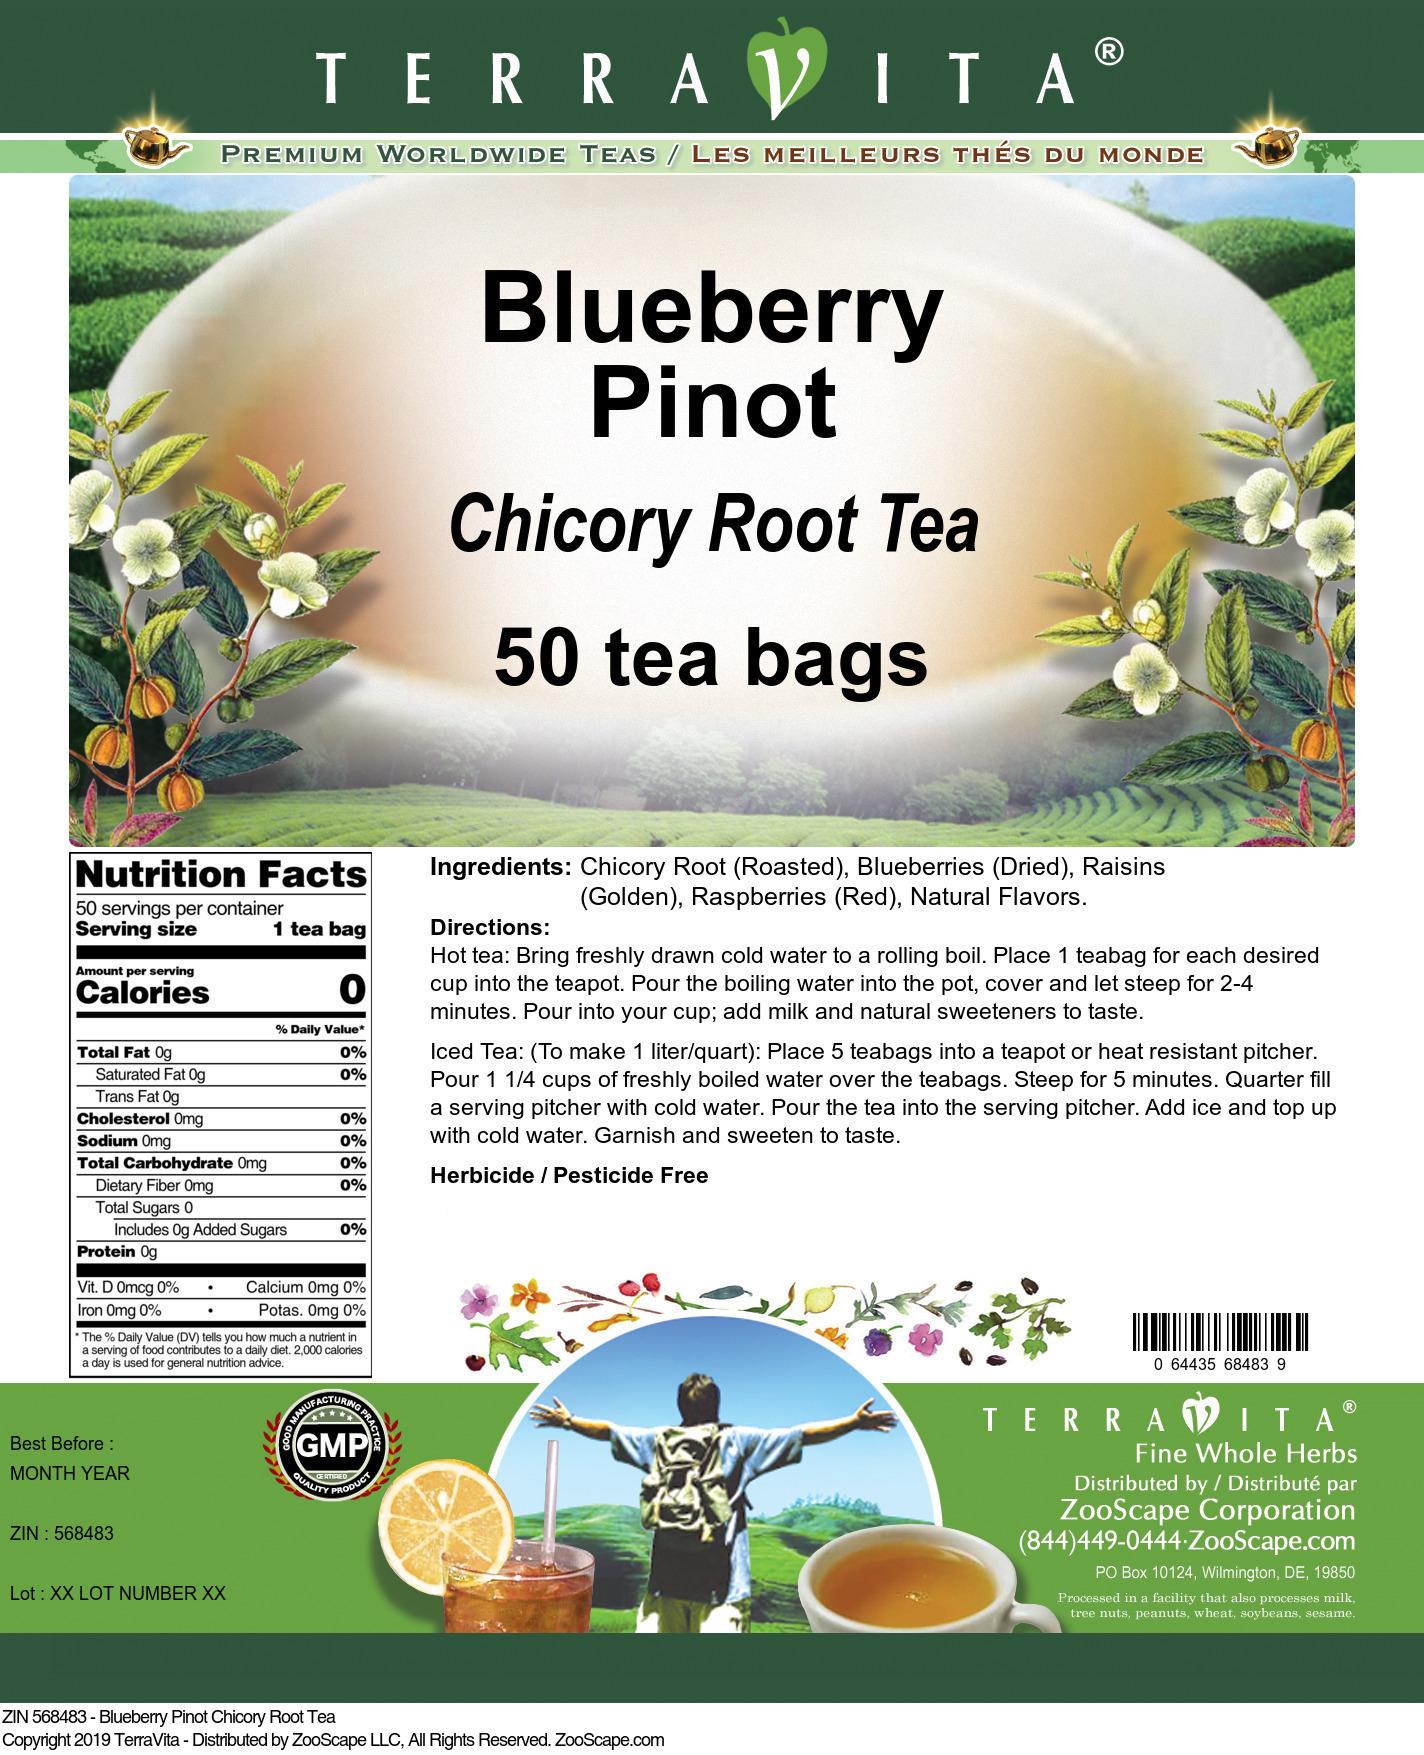 Blueberry Pinot Chicory Root